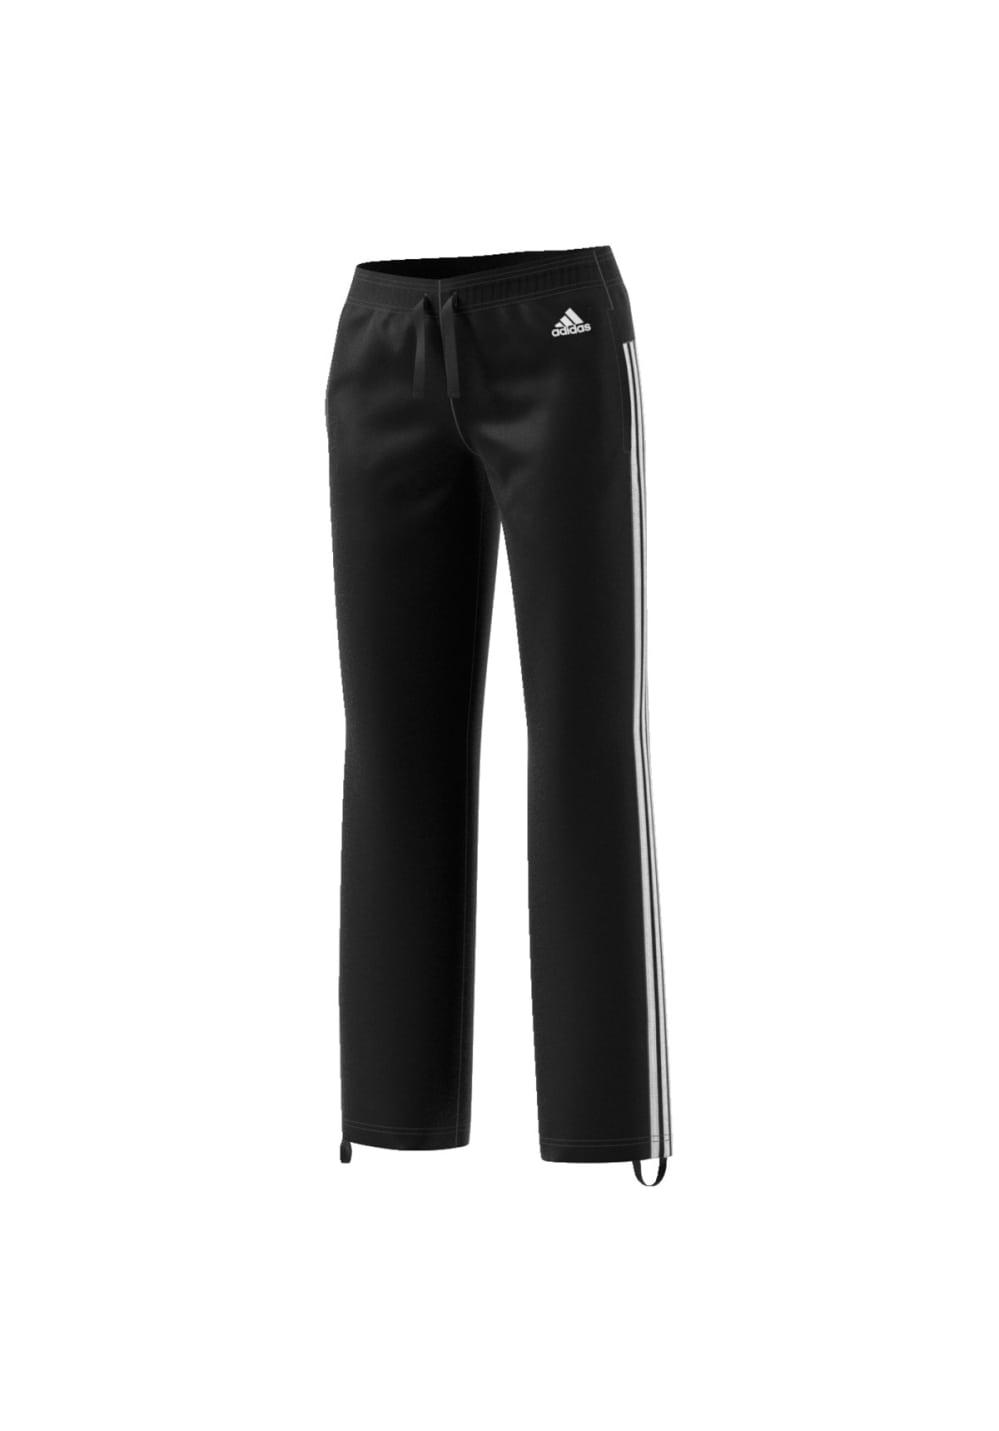 8001facd6 Next. adidas. Essentials 3 Stripes Pant Open Hem - Running trousers for  Women